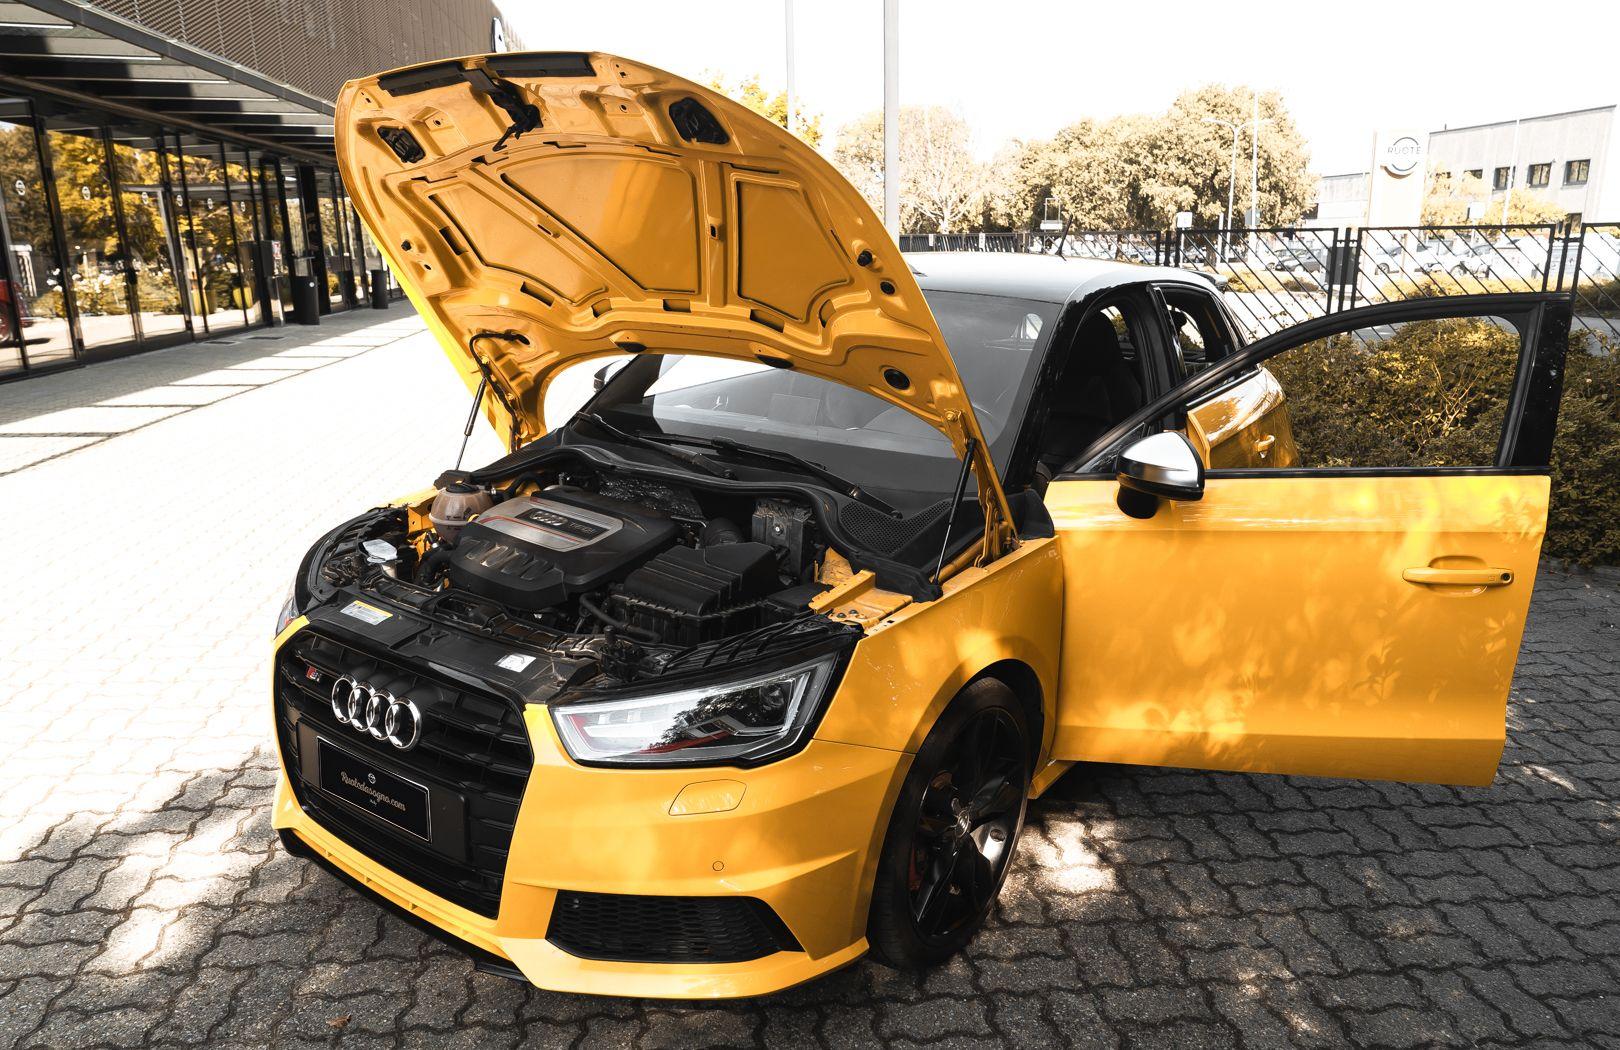 2014 Audi S1 Sportback 2.0 TFSI Quattro 83652